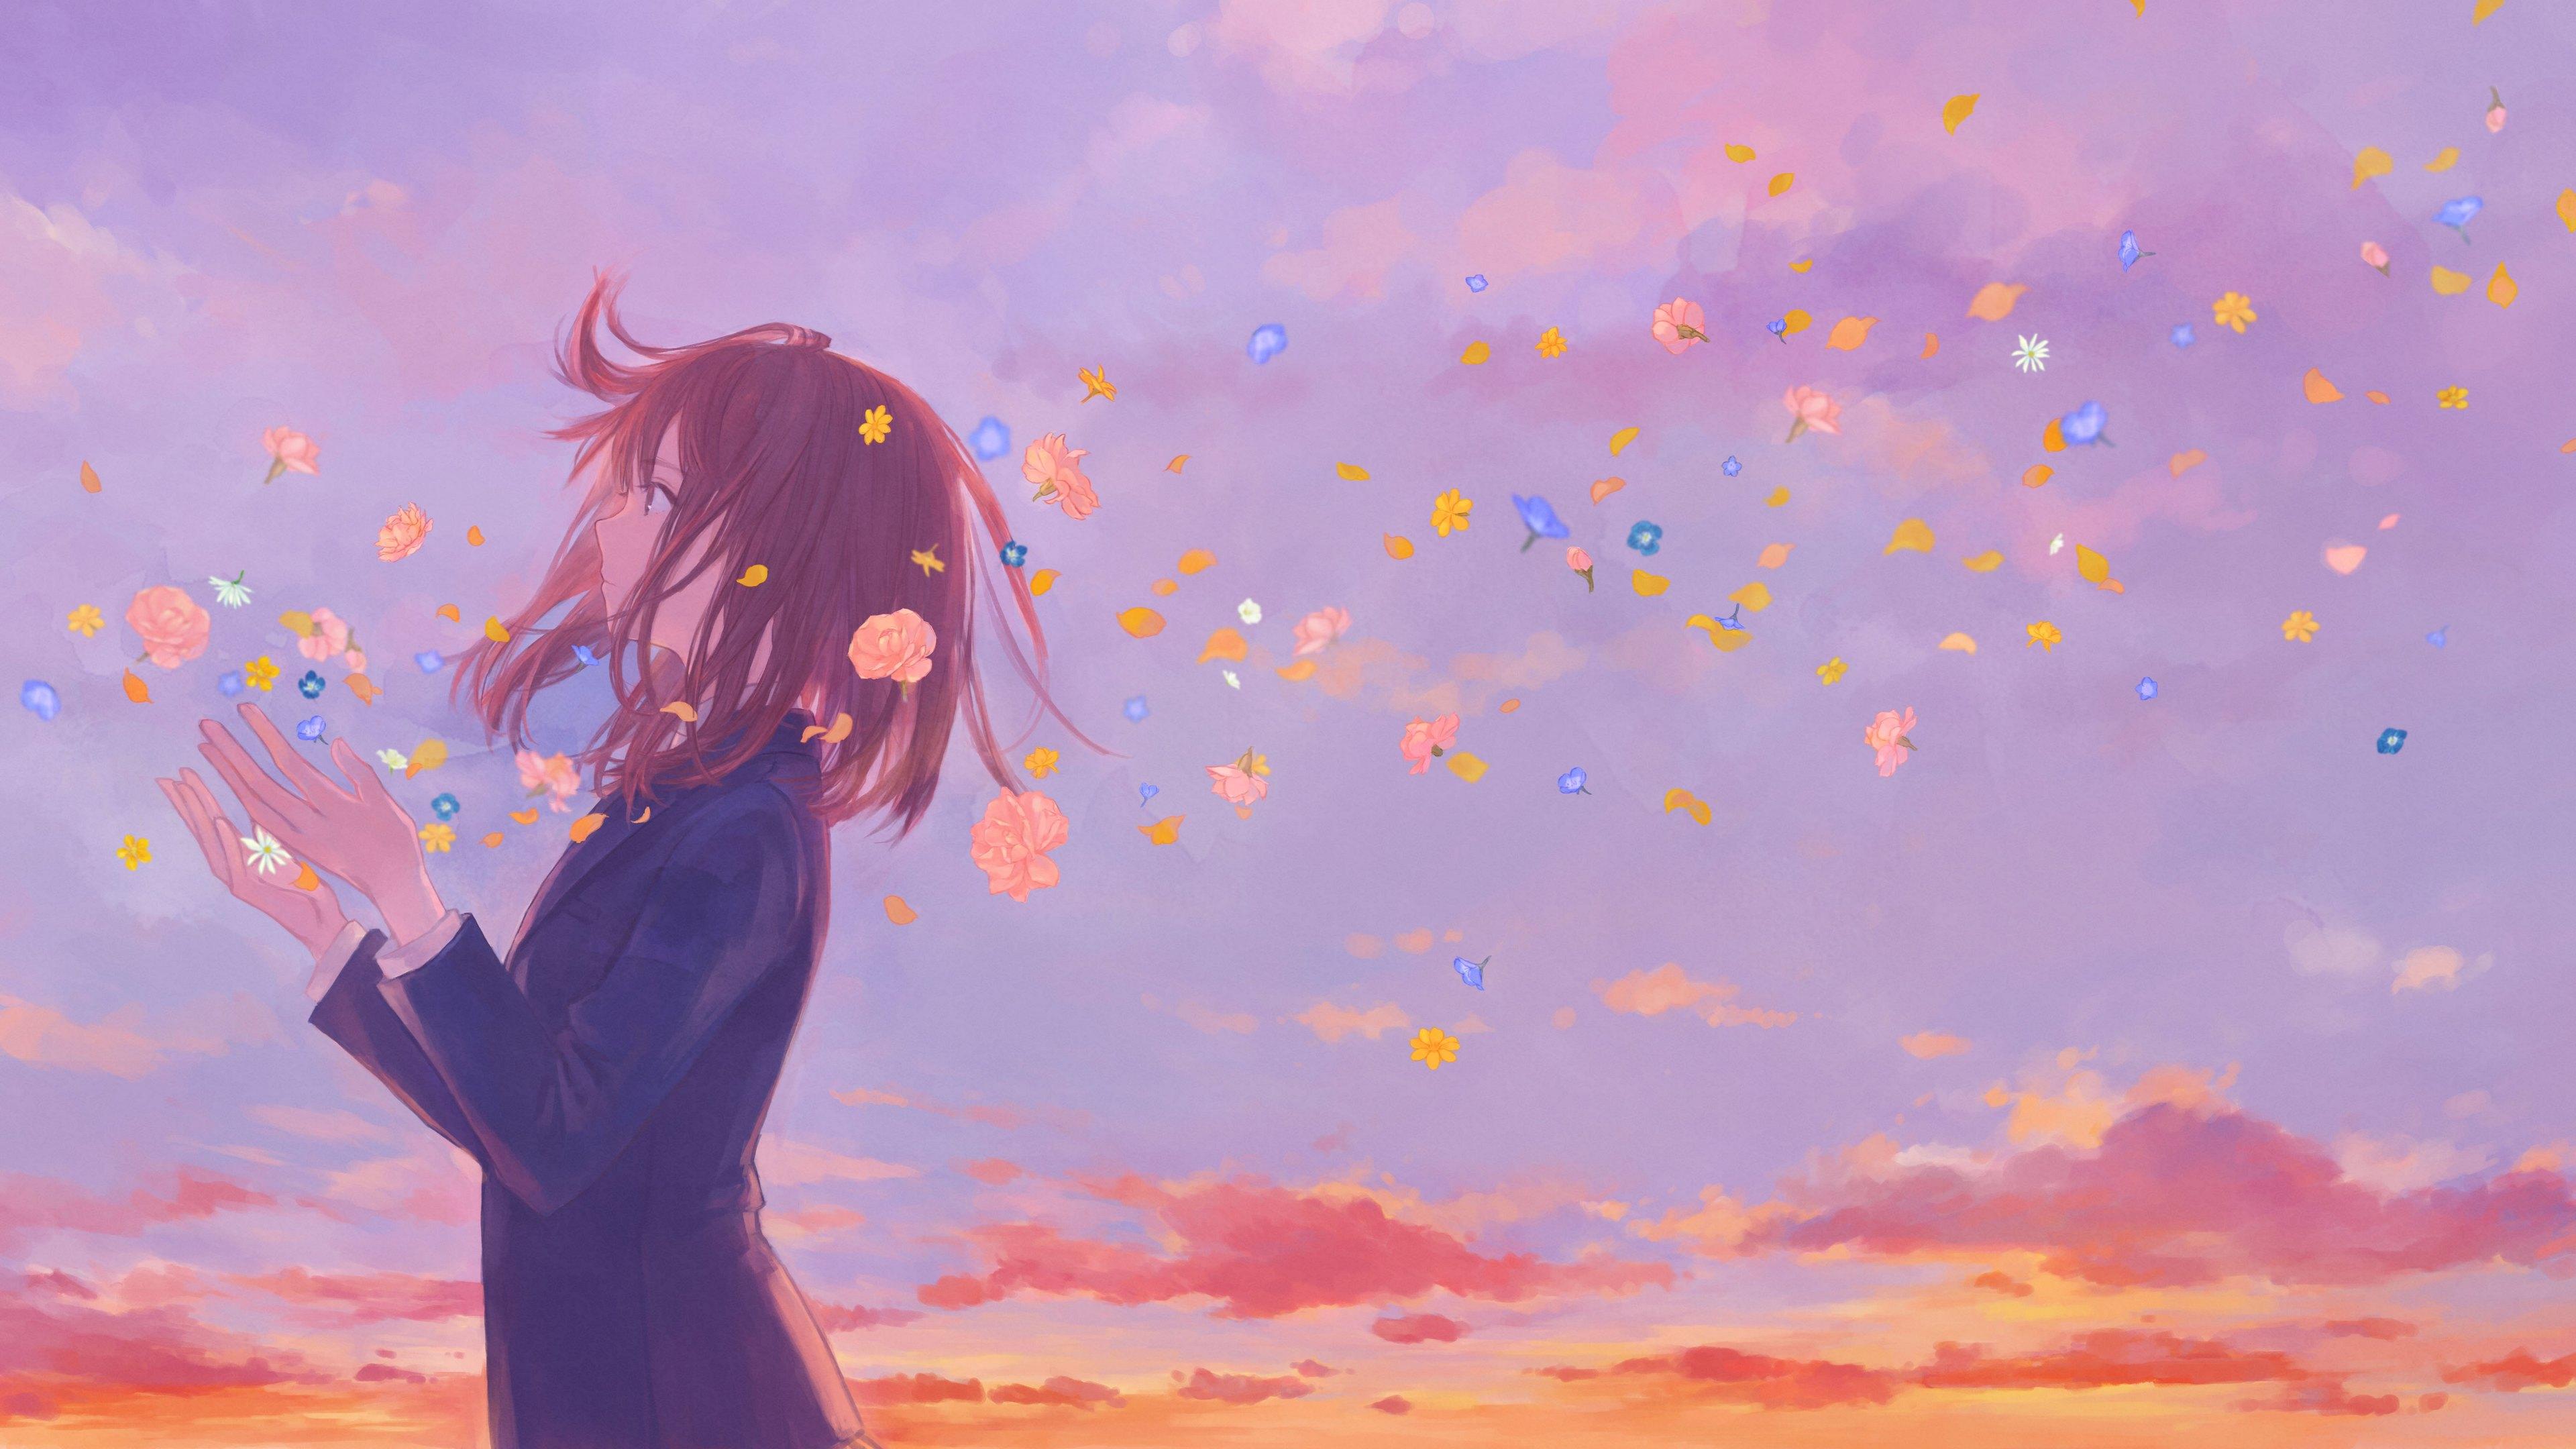 anime girl school uniform flowers clouds 4k 1541974009 - Anime Girl School Uniform Flowers Clouds 4k - school wallpapers, hd-wallpapers, flowers wallpapers, clouds wallpapers, anime wallpapers, anime girl wallpapers, 4k-wallpapers